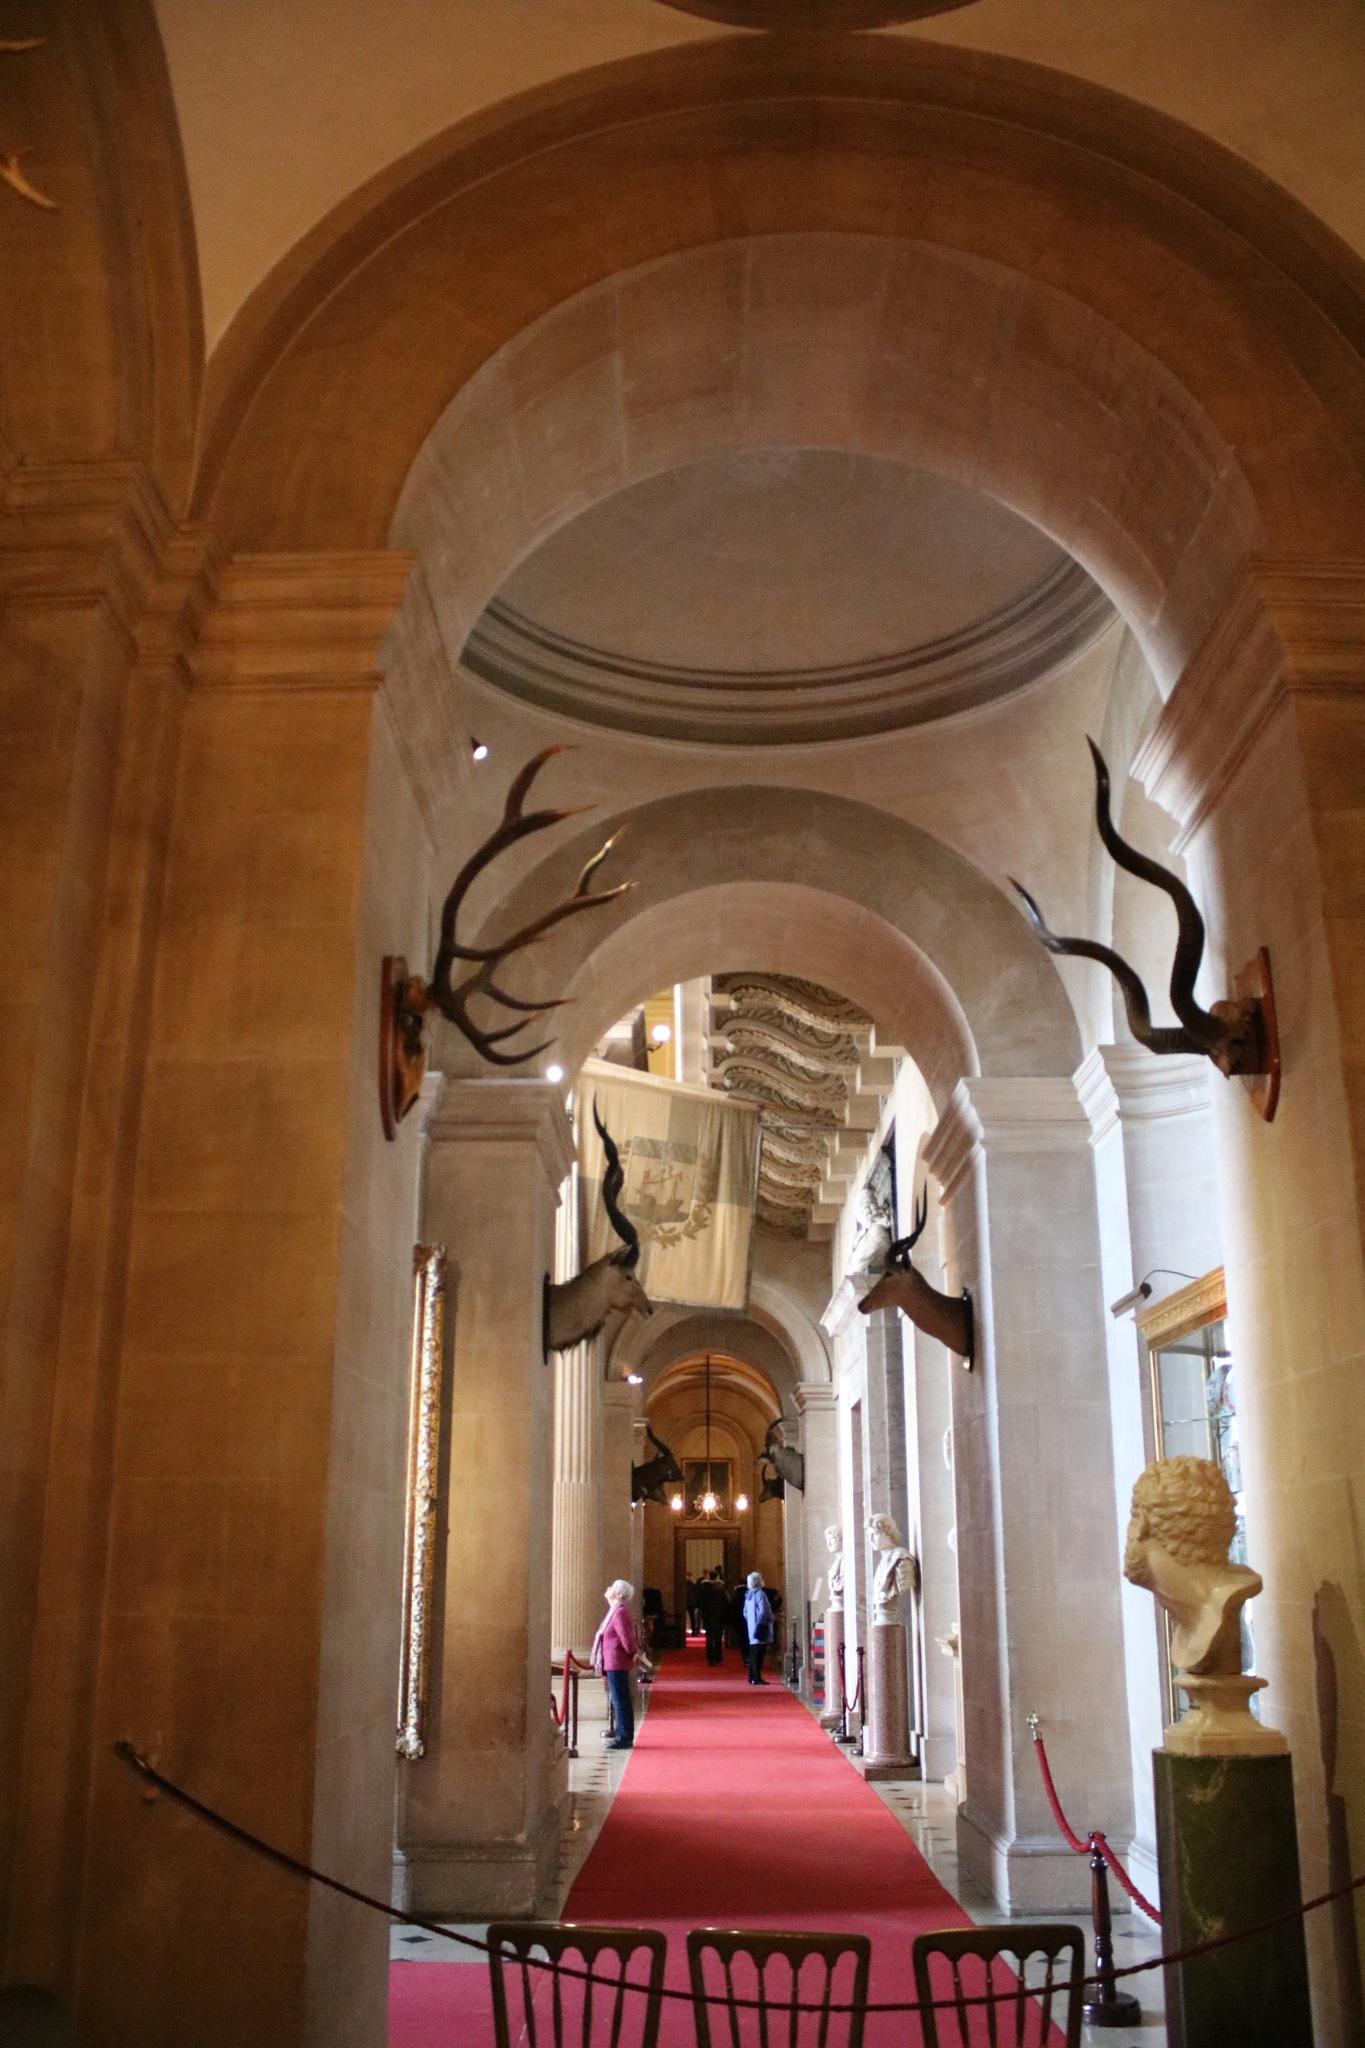 A corridor inside Blenhiem Palace by Mo Dessouki